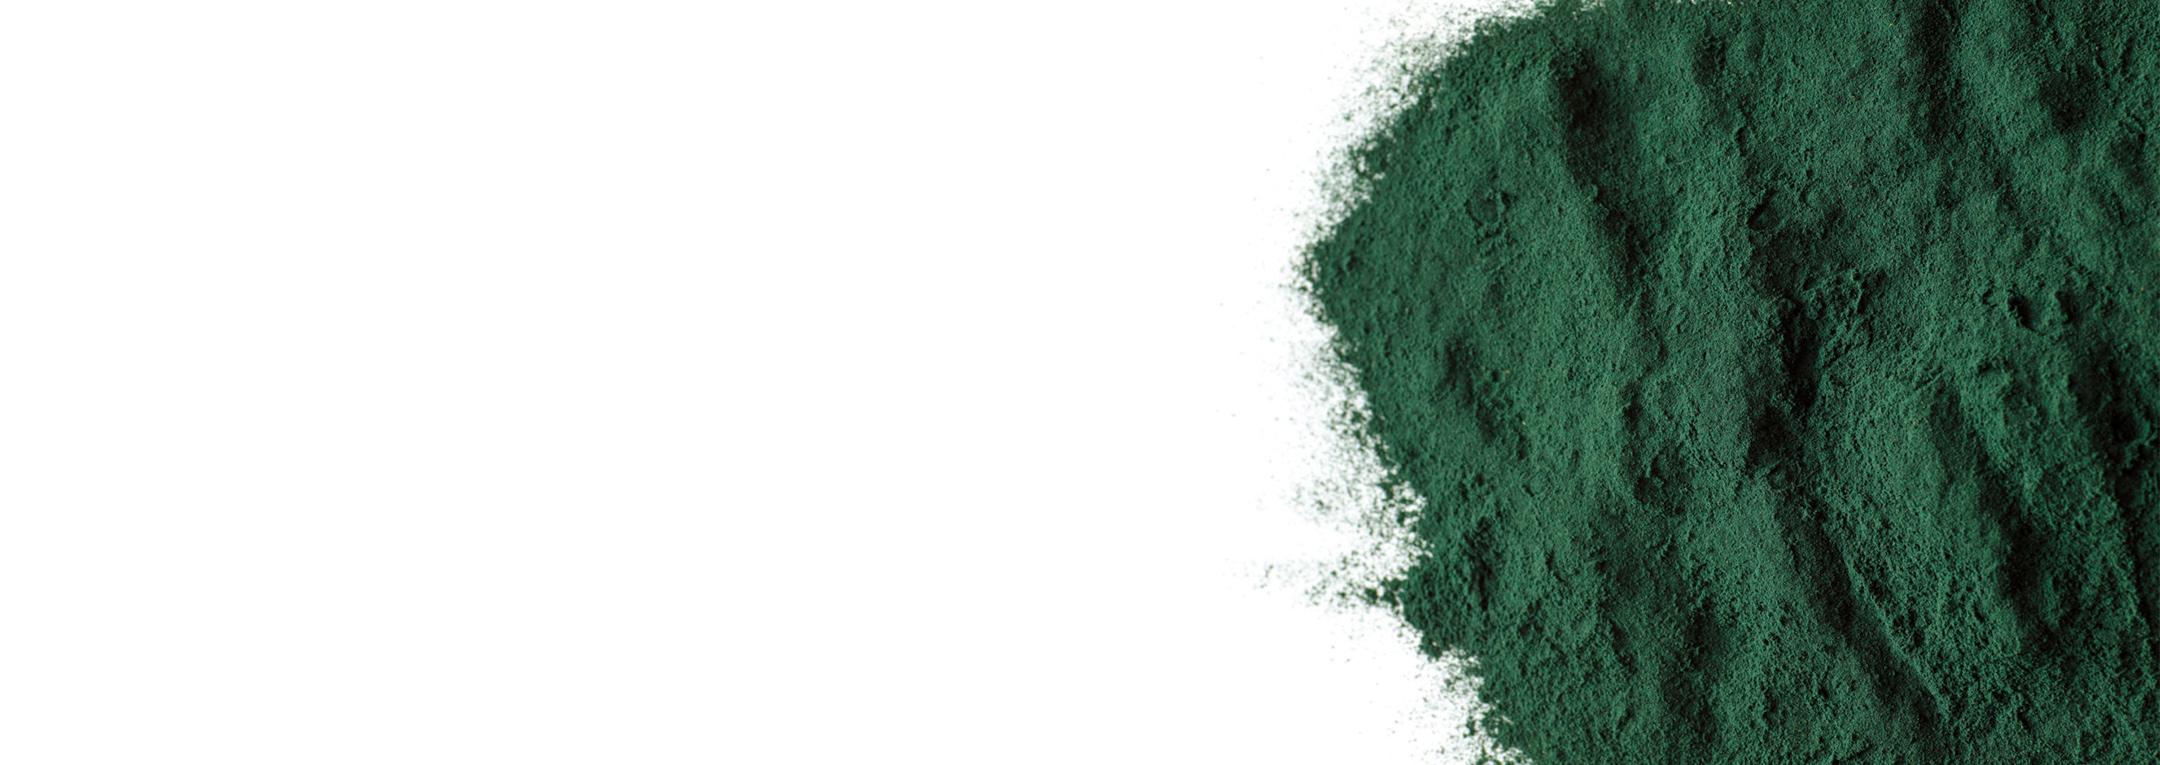 27 Rosiers Spirulina hero